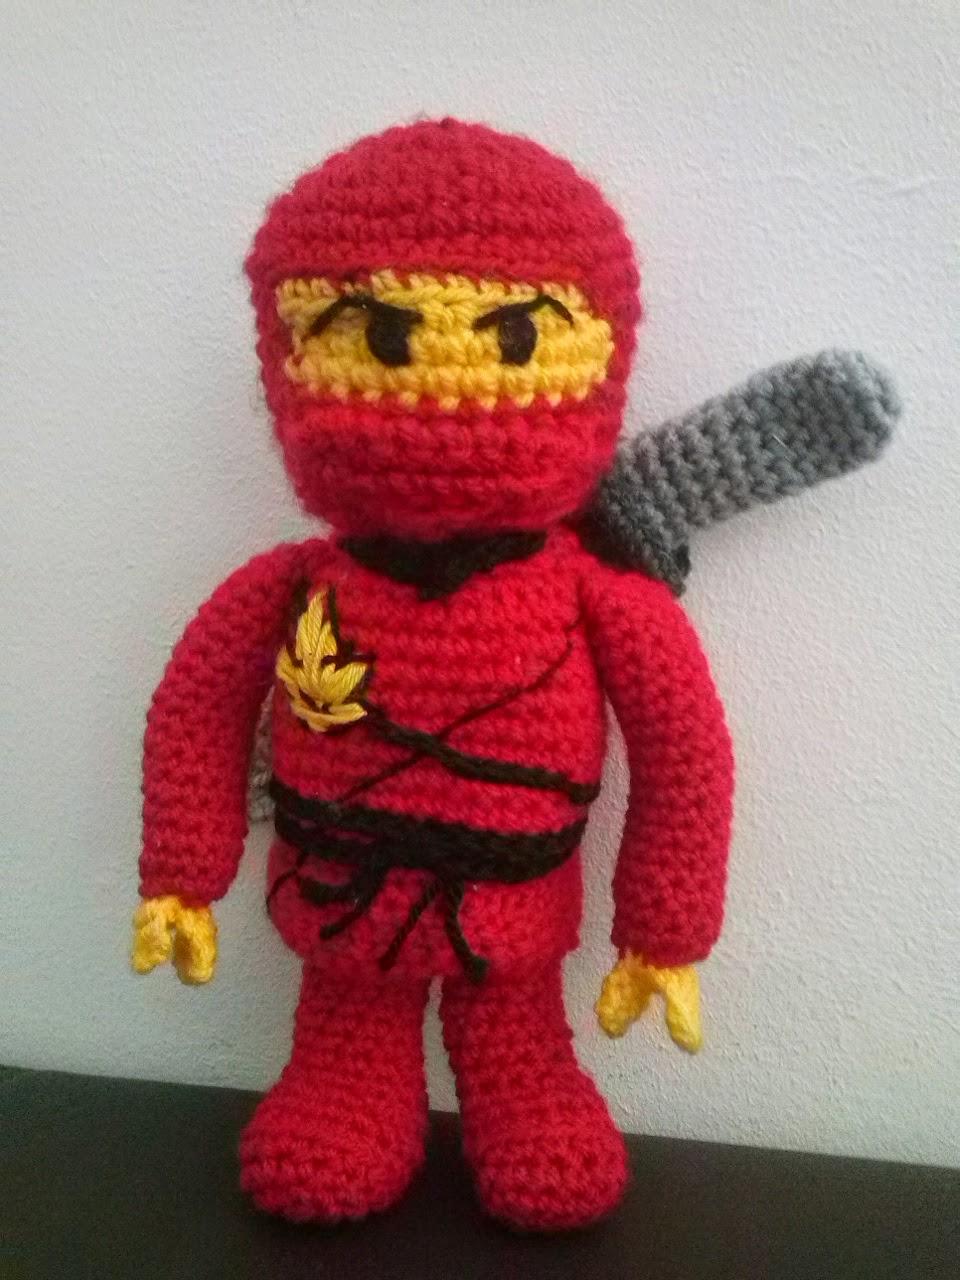 Handmade Crochet Amigurumi Toys- READY FOR POSTING - Album on Imgur | 1280x960